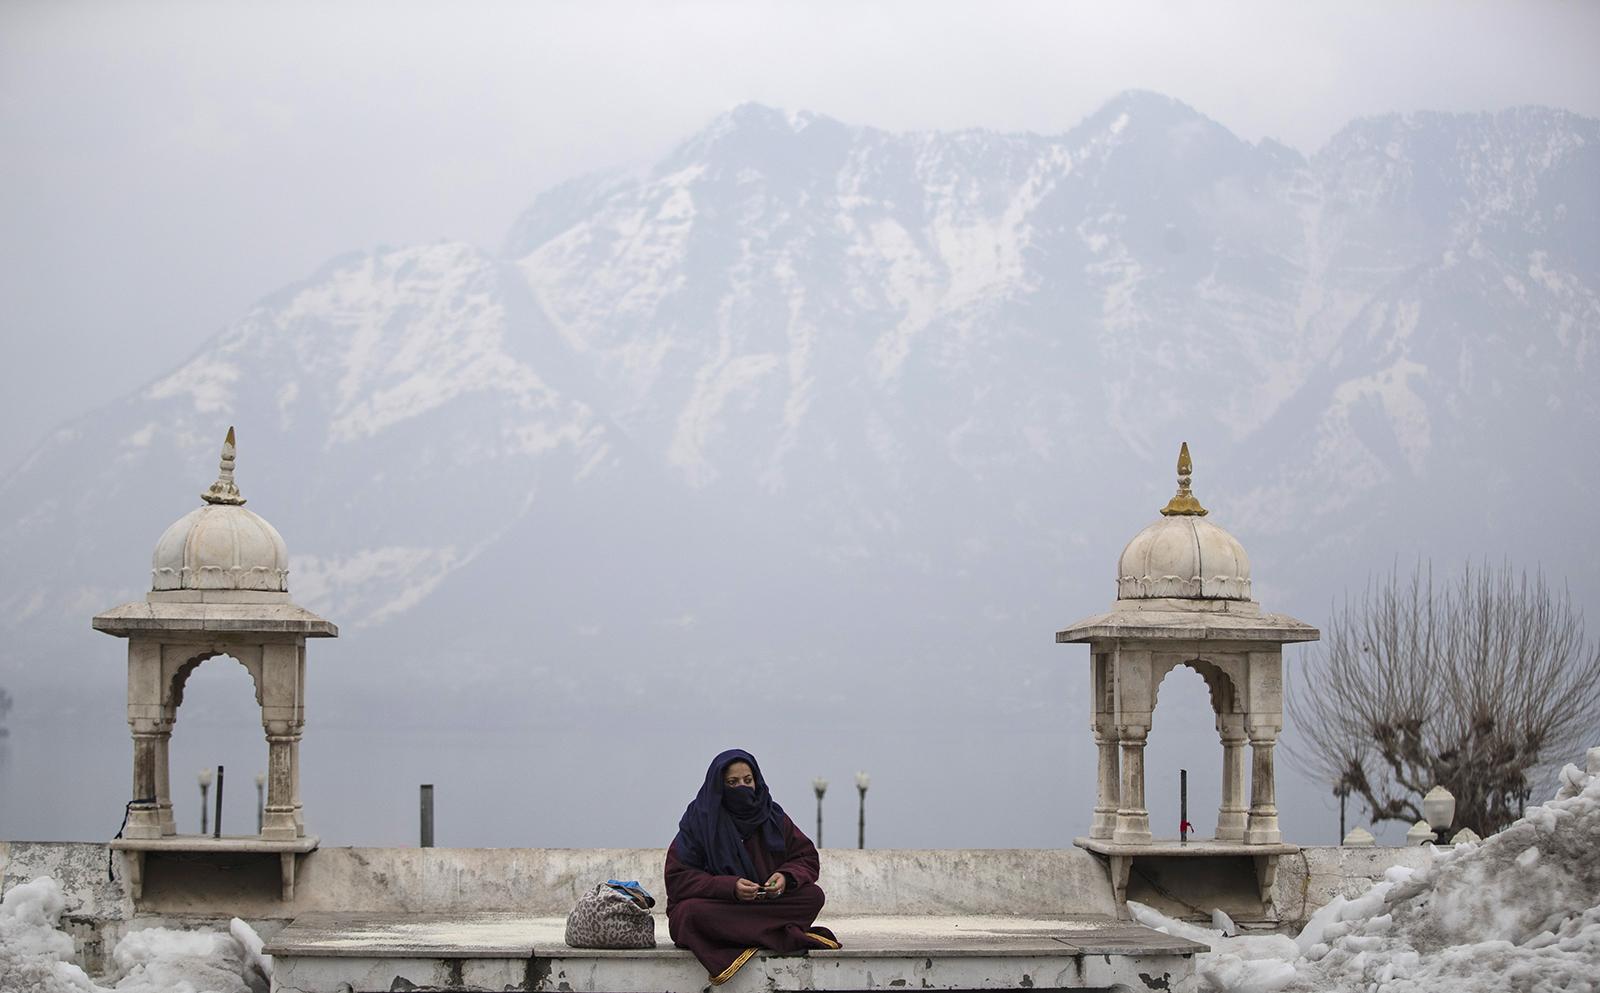 A Kashmiri Muslim woman prays outside Hazratbal Shrine after special prayers on the death anniversary of Abu Bakr Siddiq, the first Caliph of Islam, at Hazratbal Shrine in Srinagar, Indian controlled Kashmir, Friday, Feb. 5, 2021. (AP Photo/Mukhtar Khan)